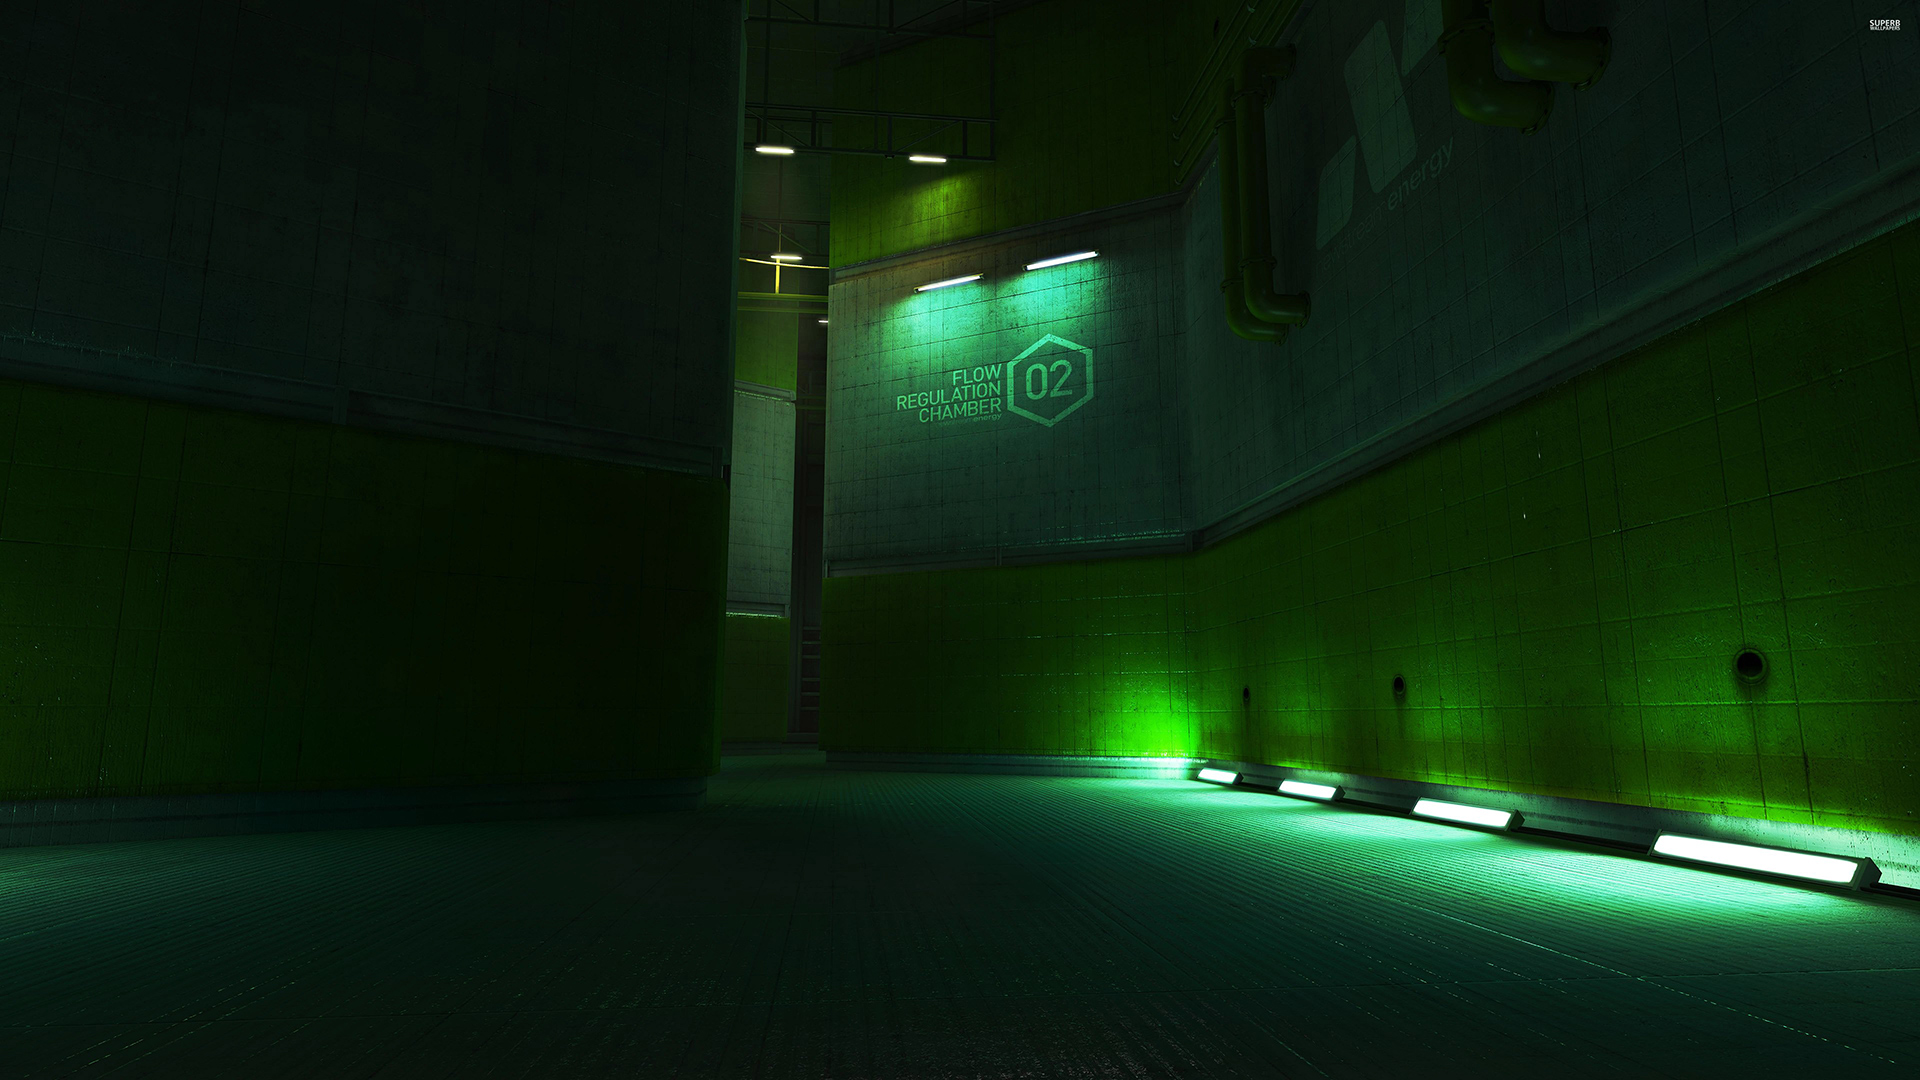 3Stormdrain_Tunnel_001.jpg